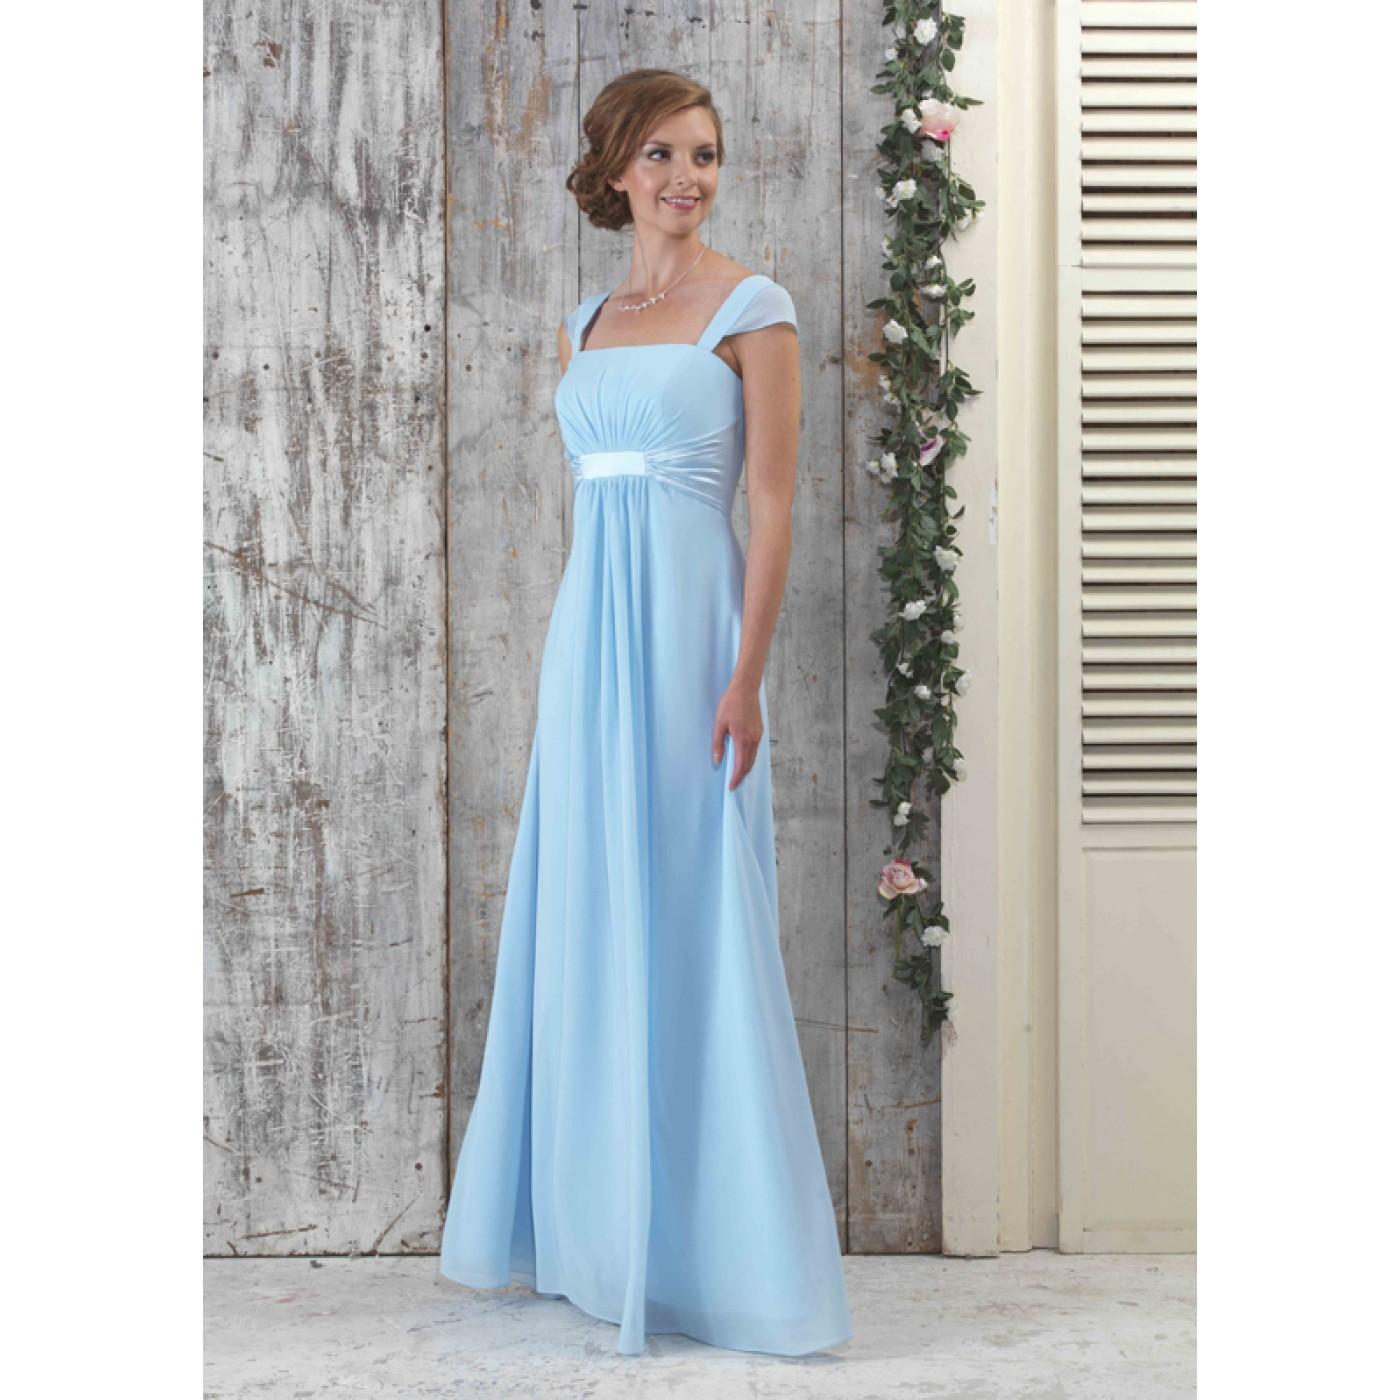 Linzi jay en327 bridesmaid dress the dressy dress shop linzi jay en327 bridesmaid dress ombrellifo Images